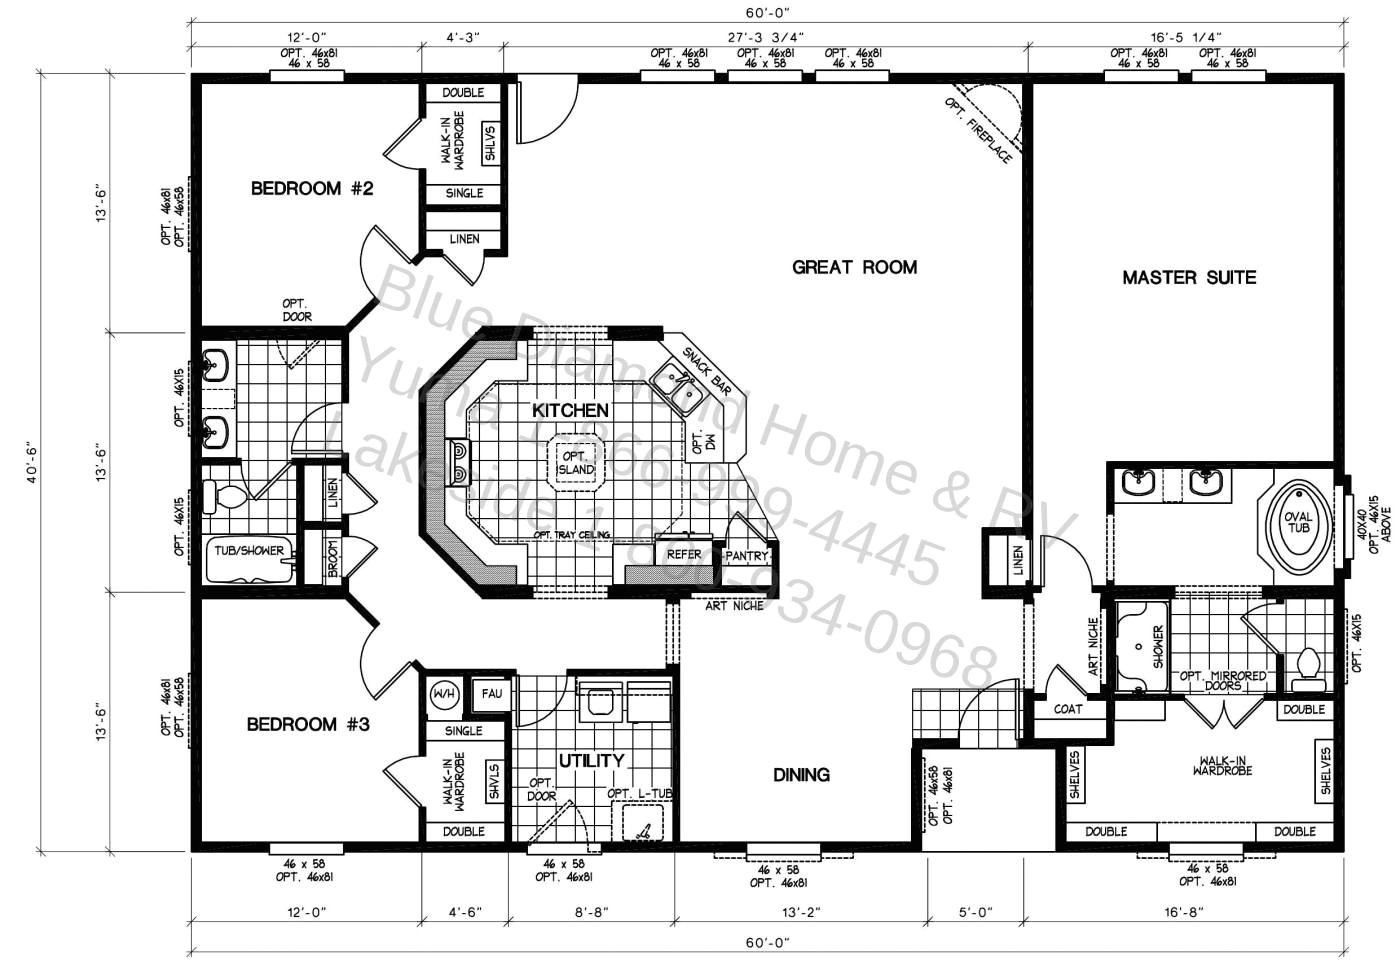 luxury new mobile home floor plans design with 4 bedroom